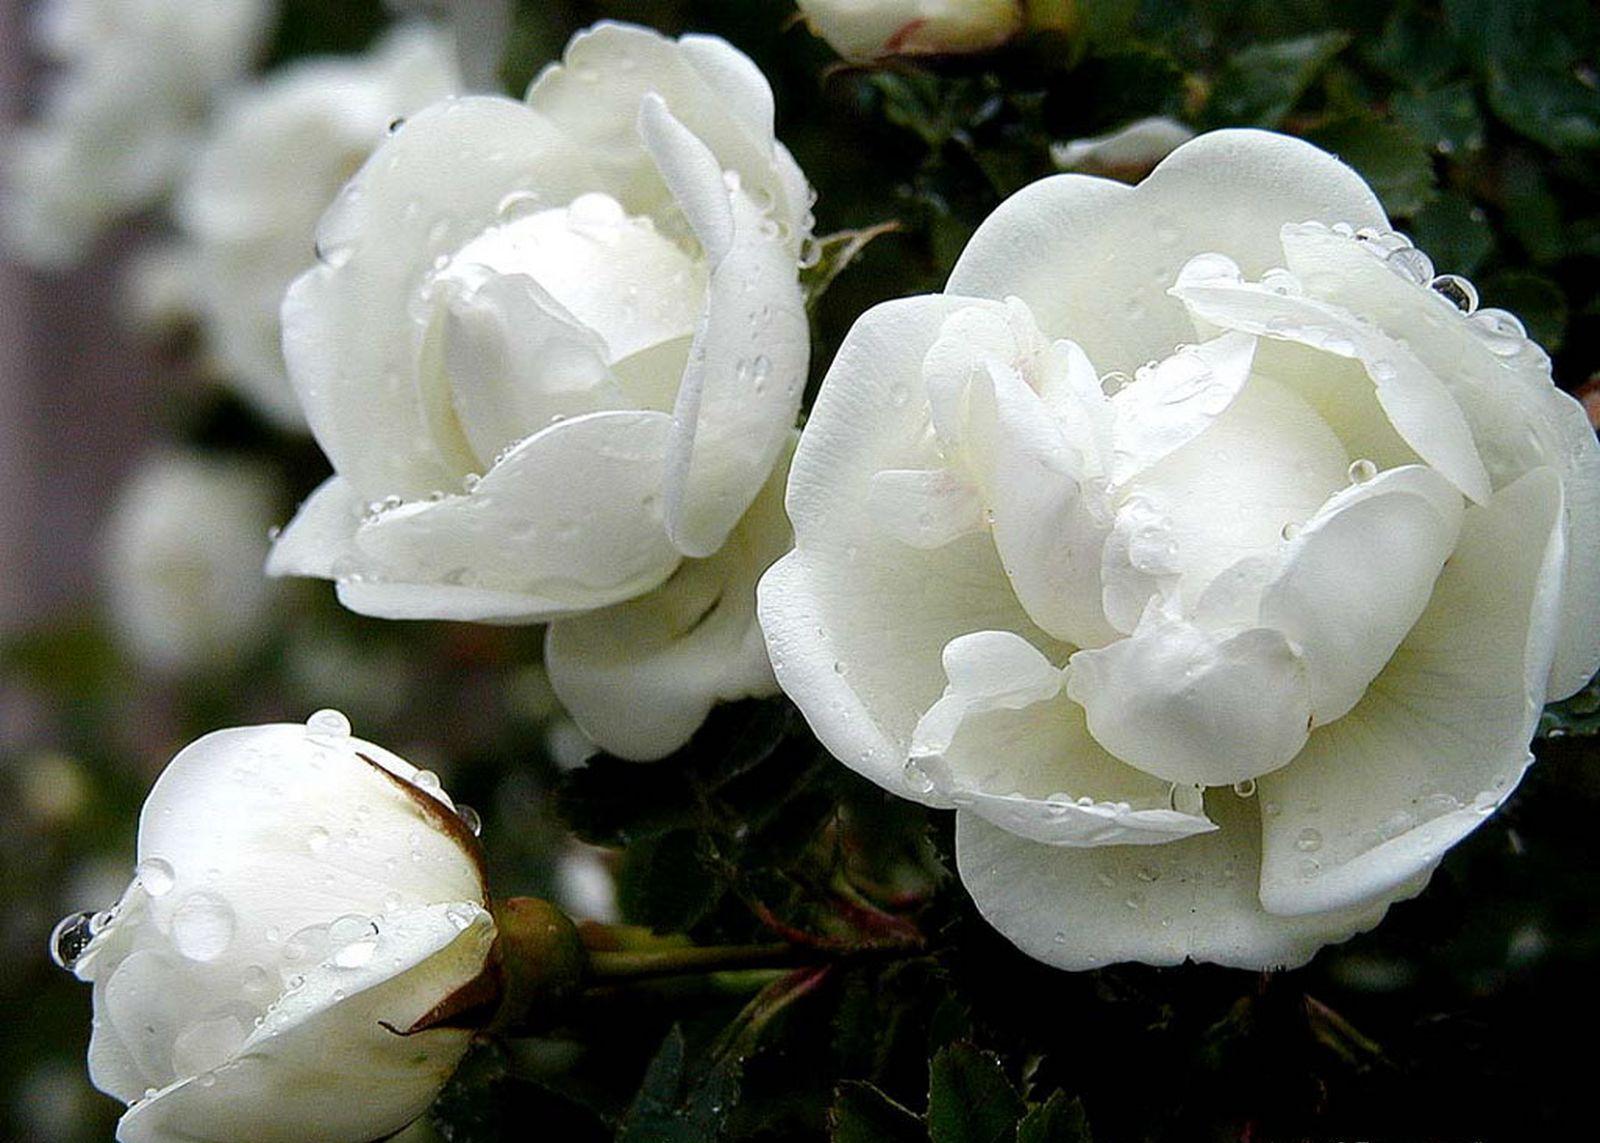 white rose flowers - photo #16